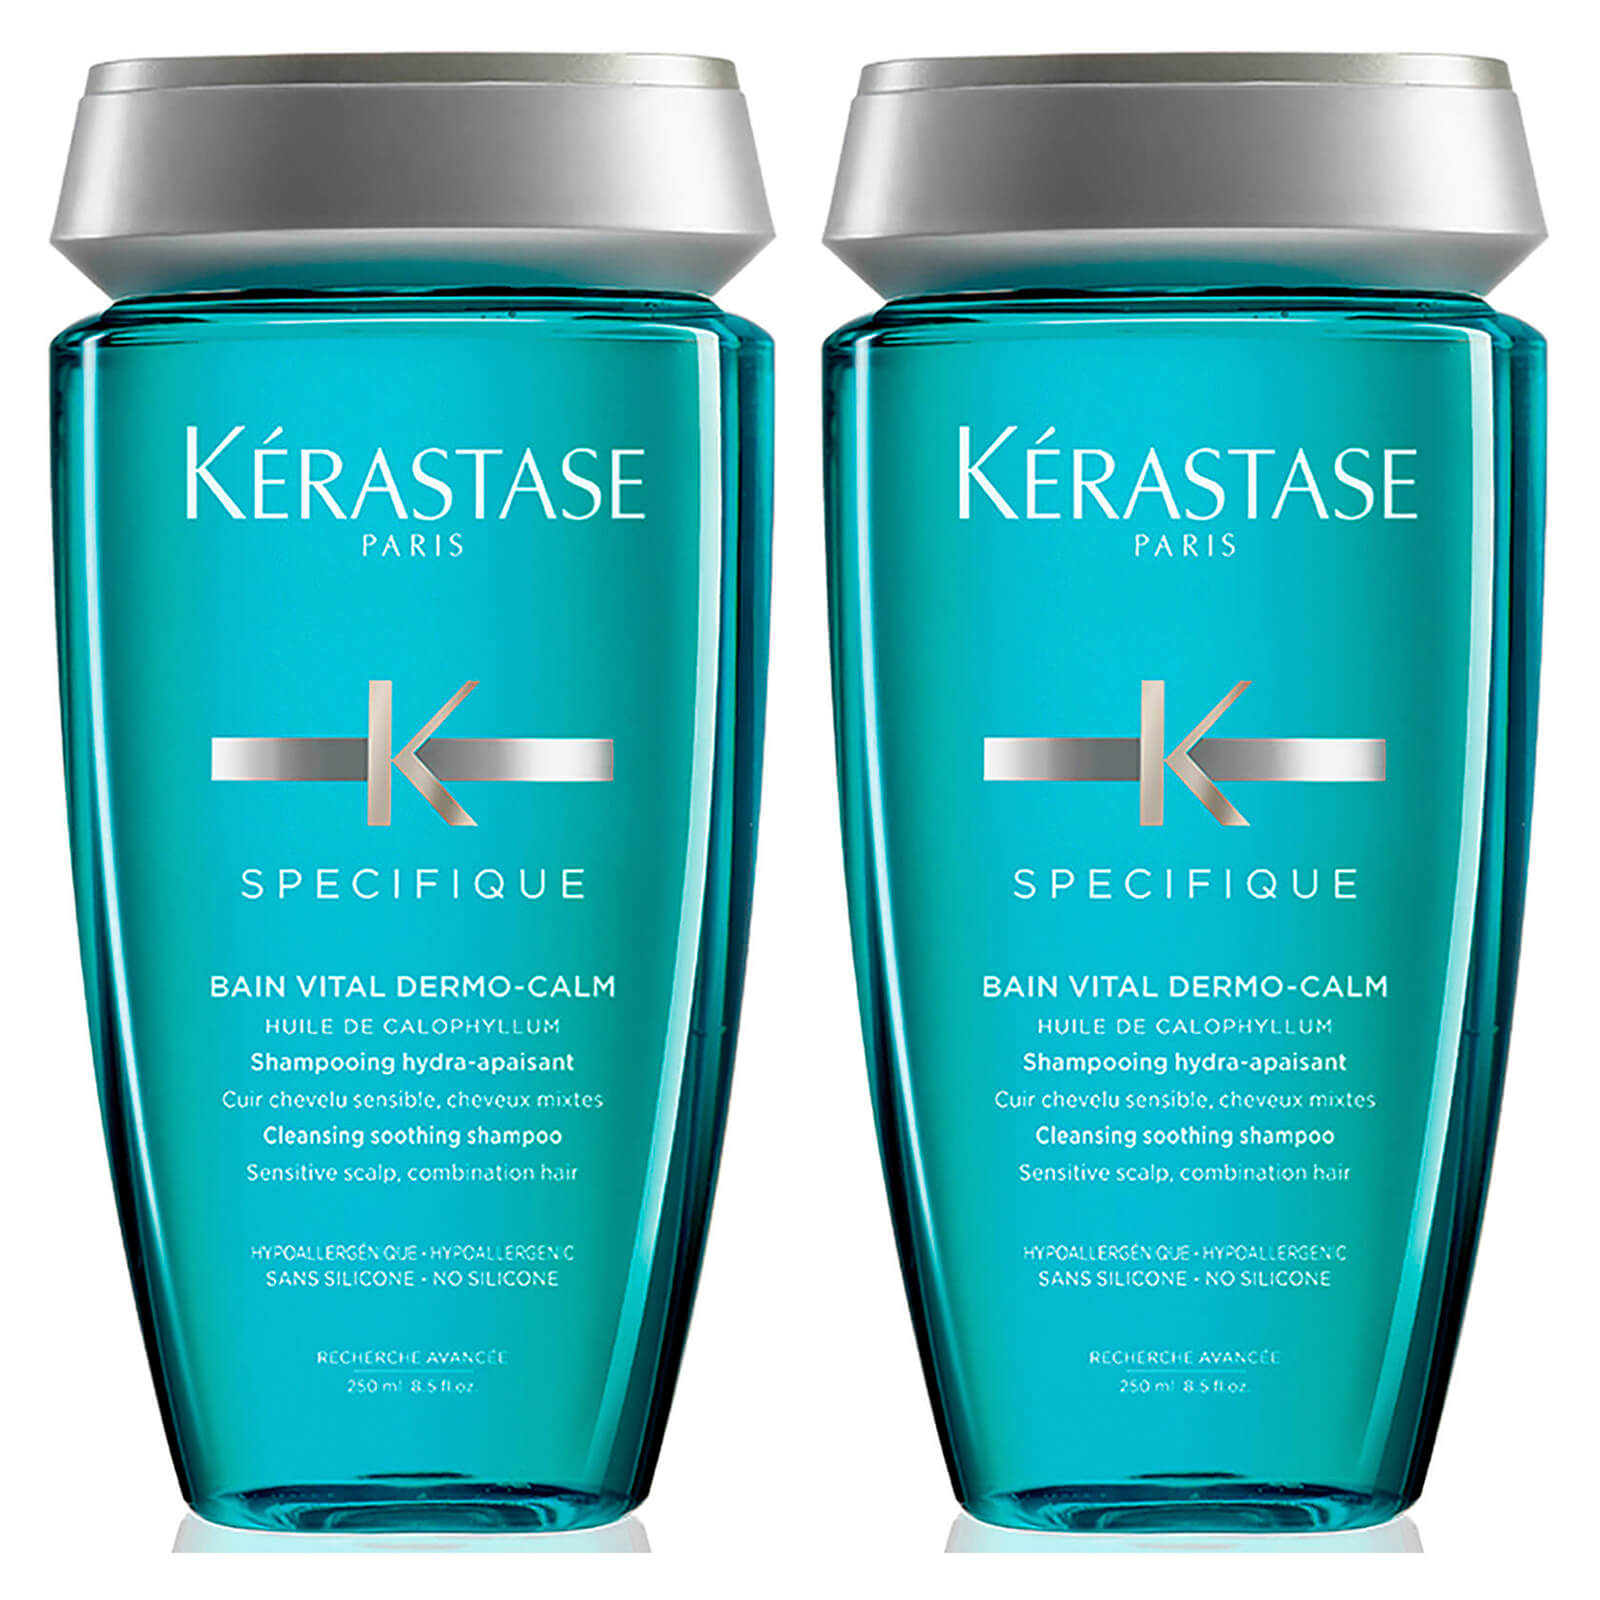 Kérastase Specifique Dermo-Calm Bain Vital Shampoo 250ml Duo